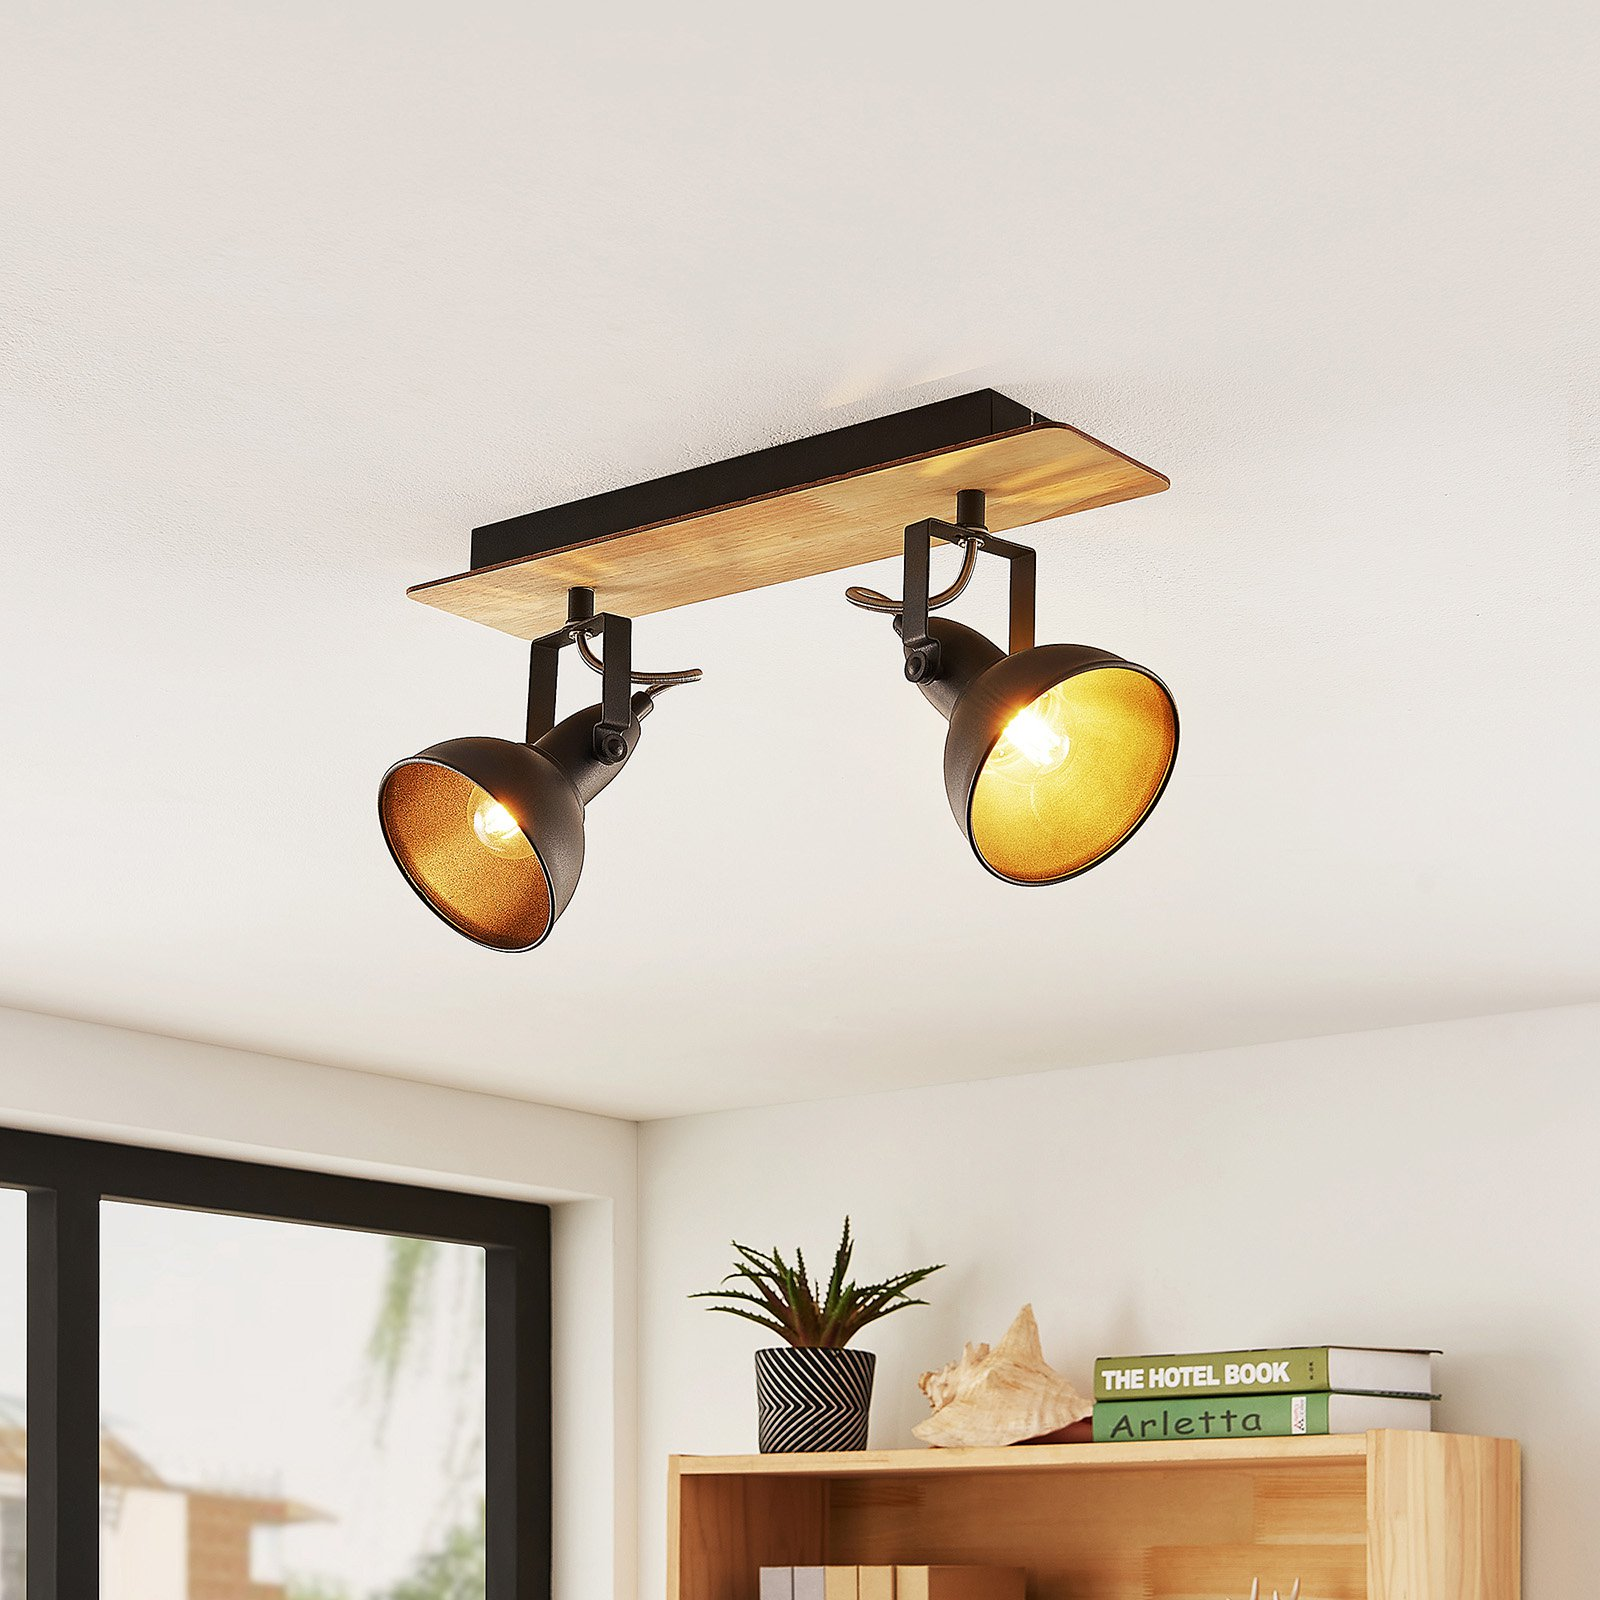 Lindby Aylis taklampe, svart, tre, 2 lyskilder